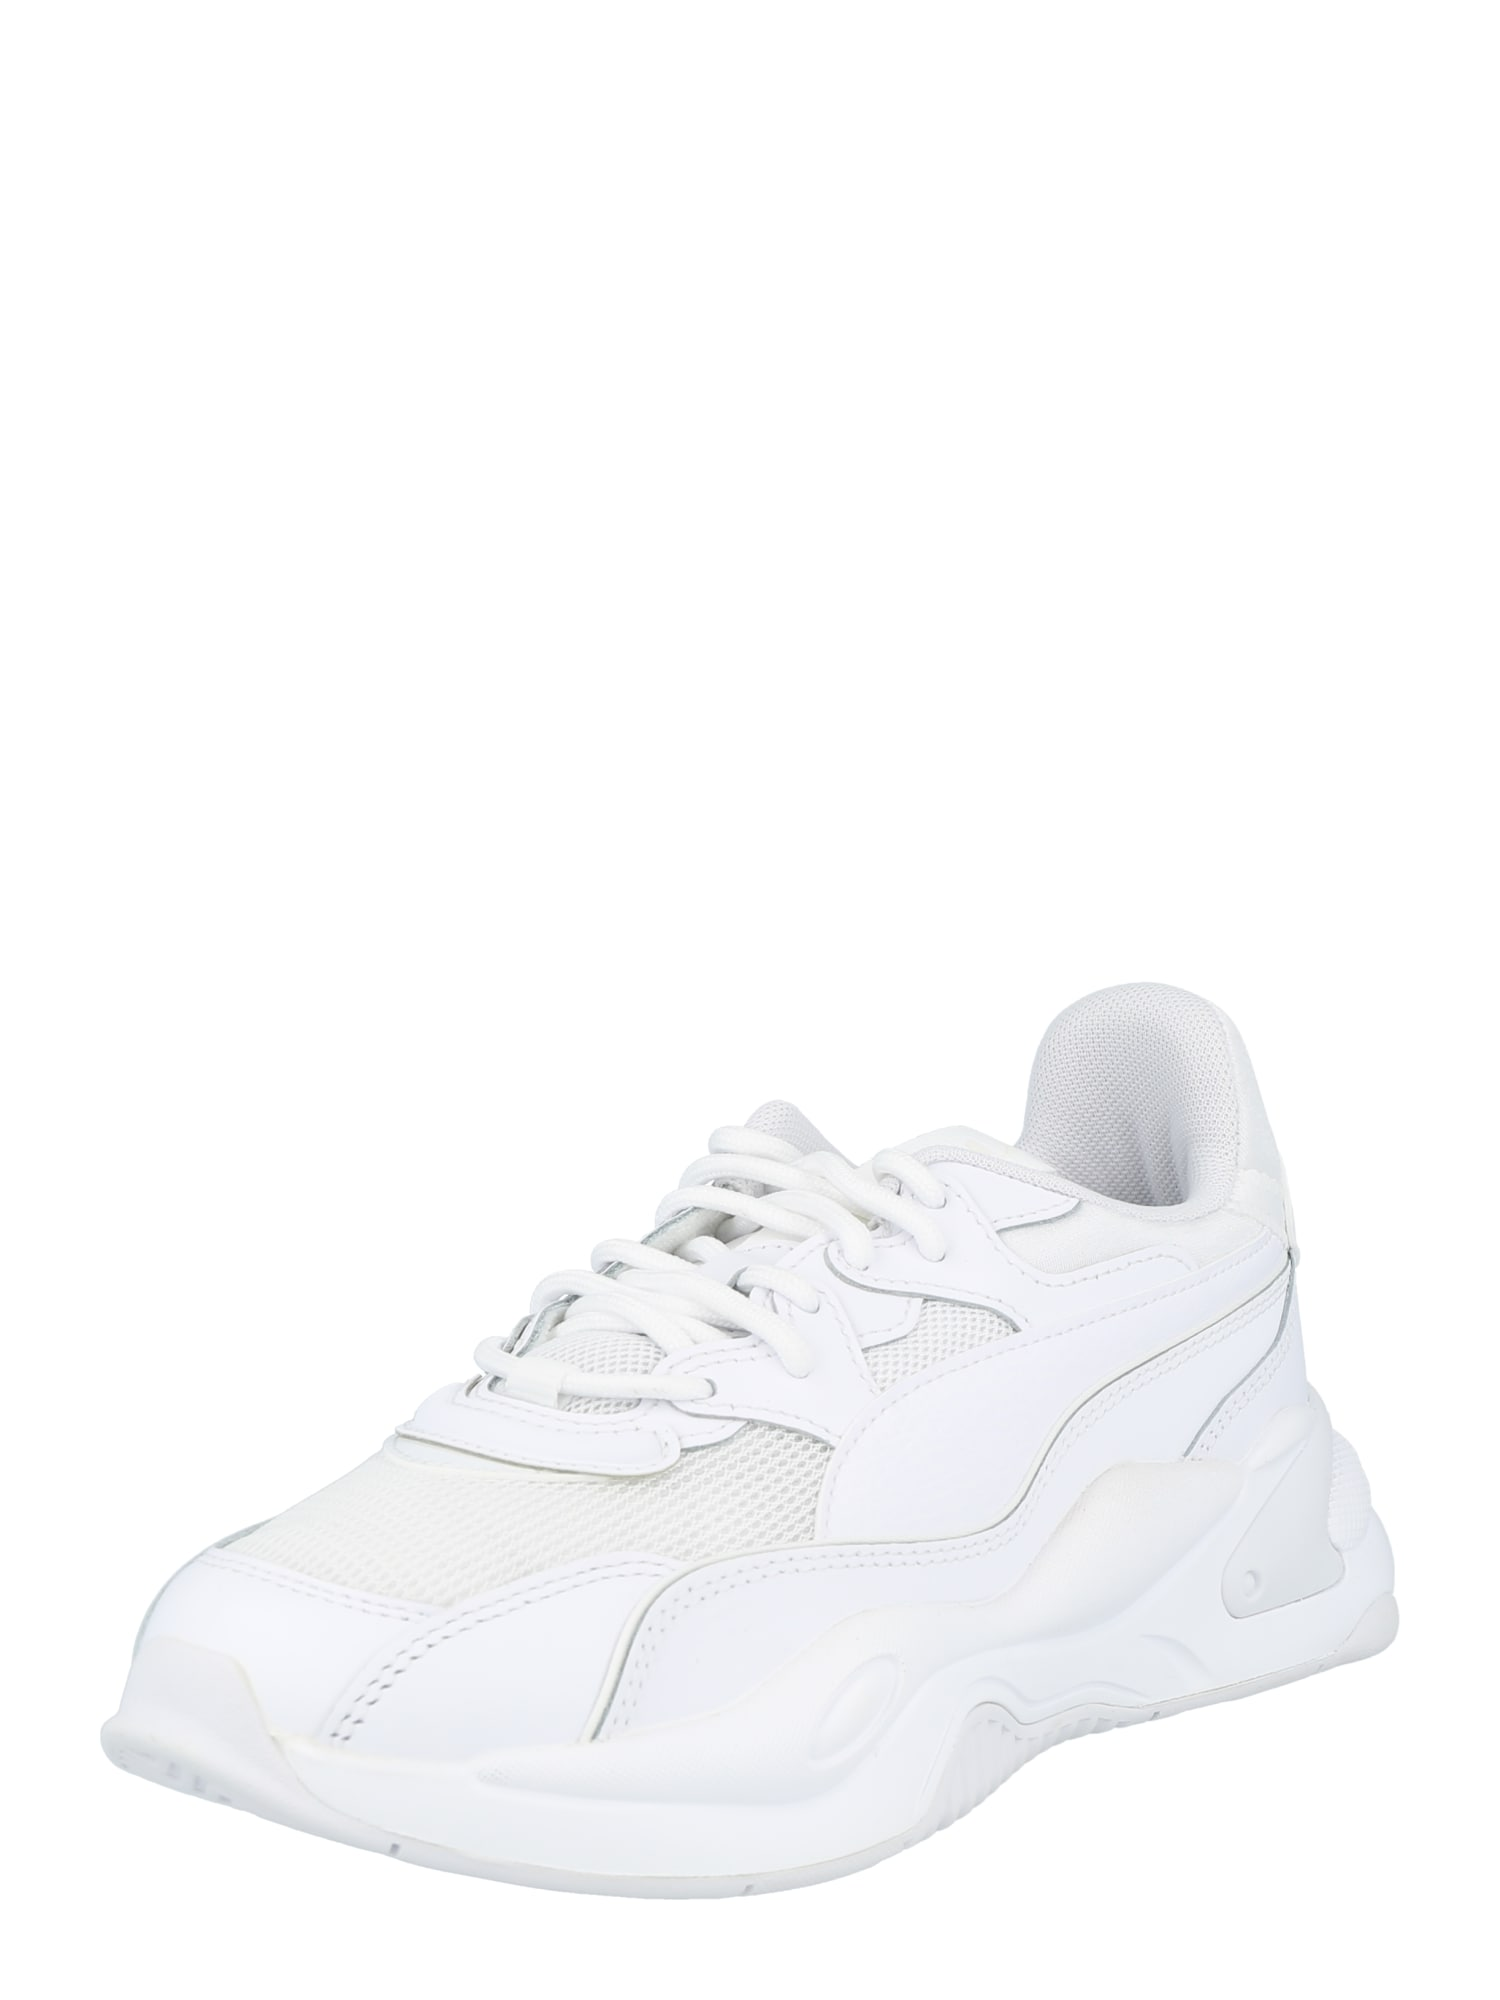 PUMA Sneaker bassa  bianco male shop the look